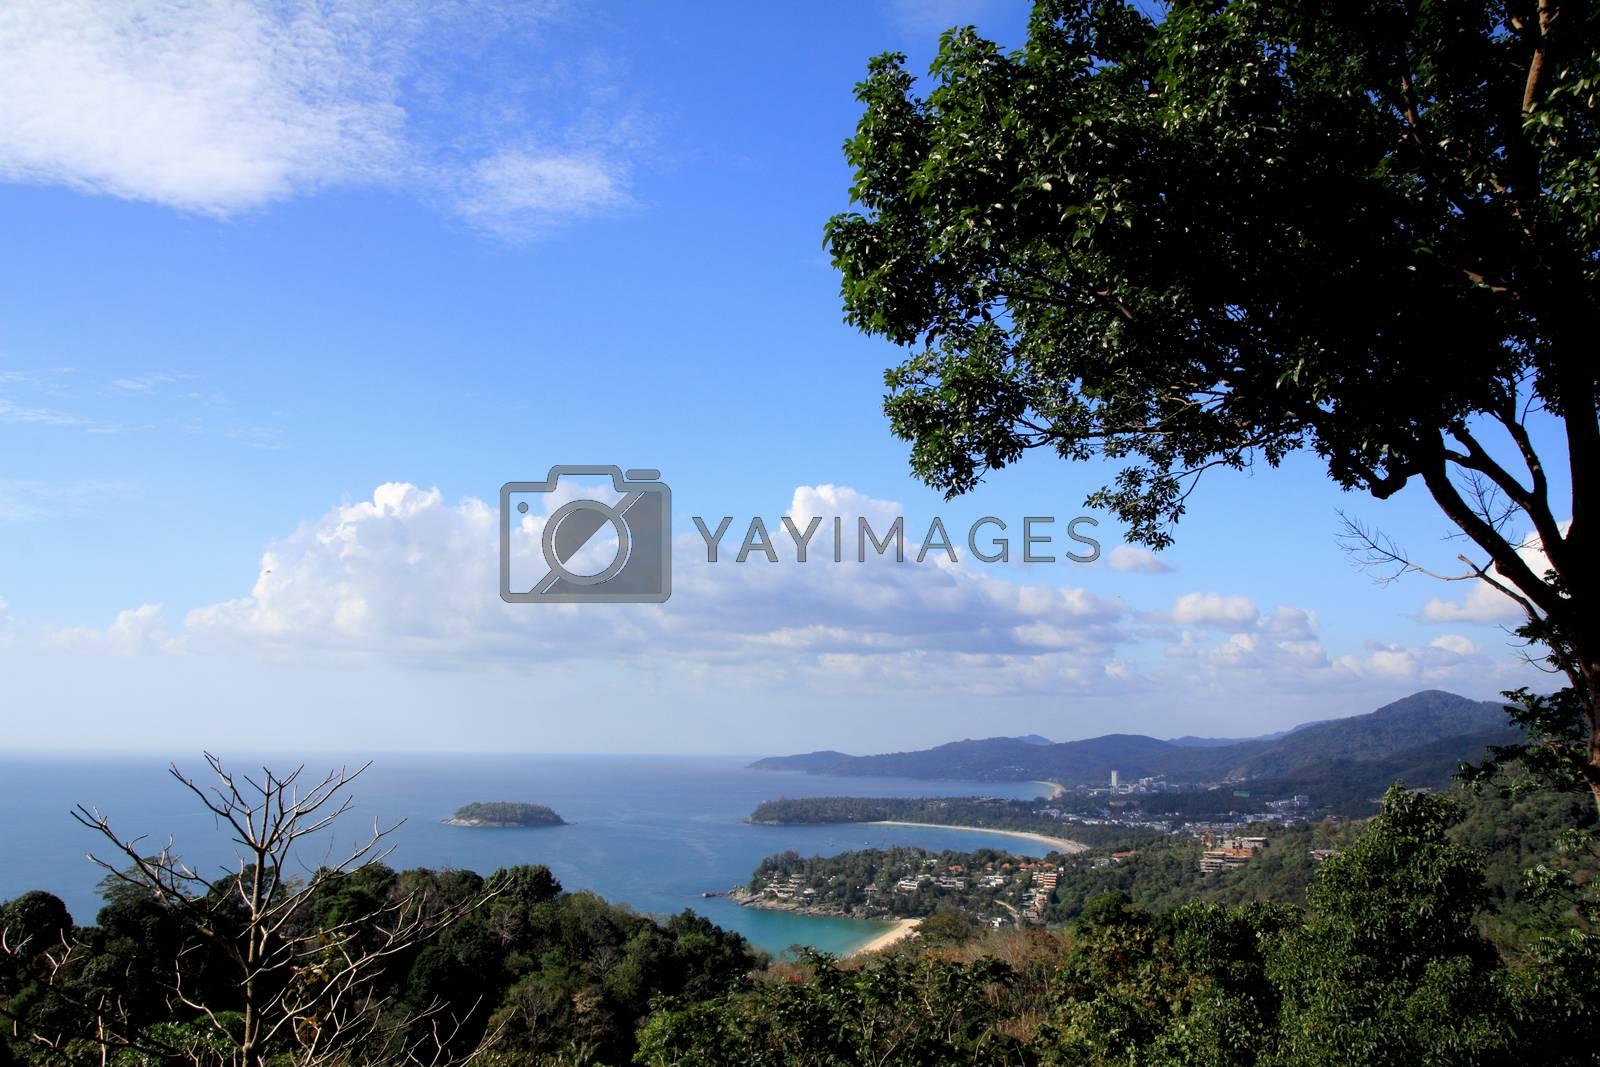 Royalty free image of Phuket view point by wyoosumran